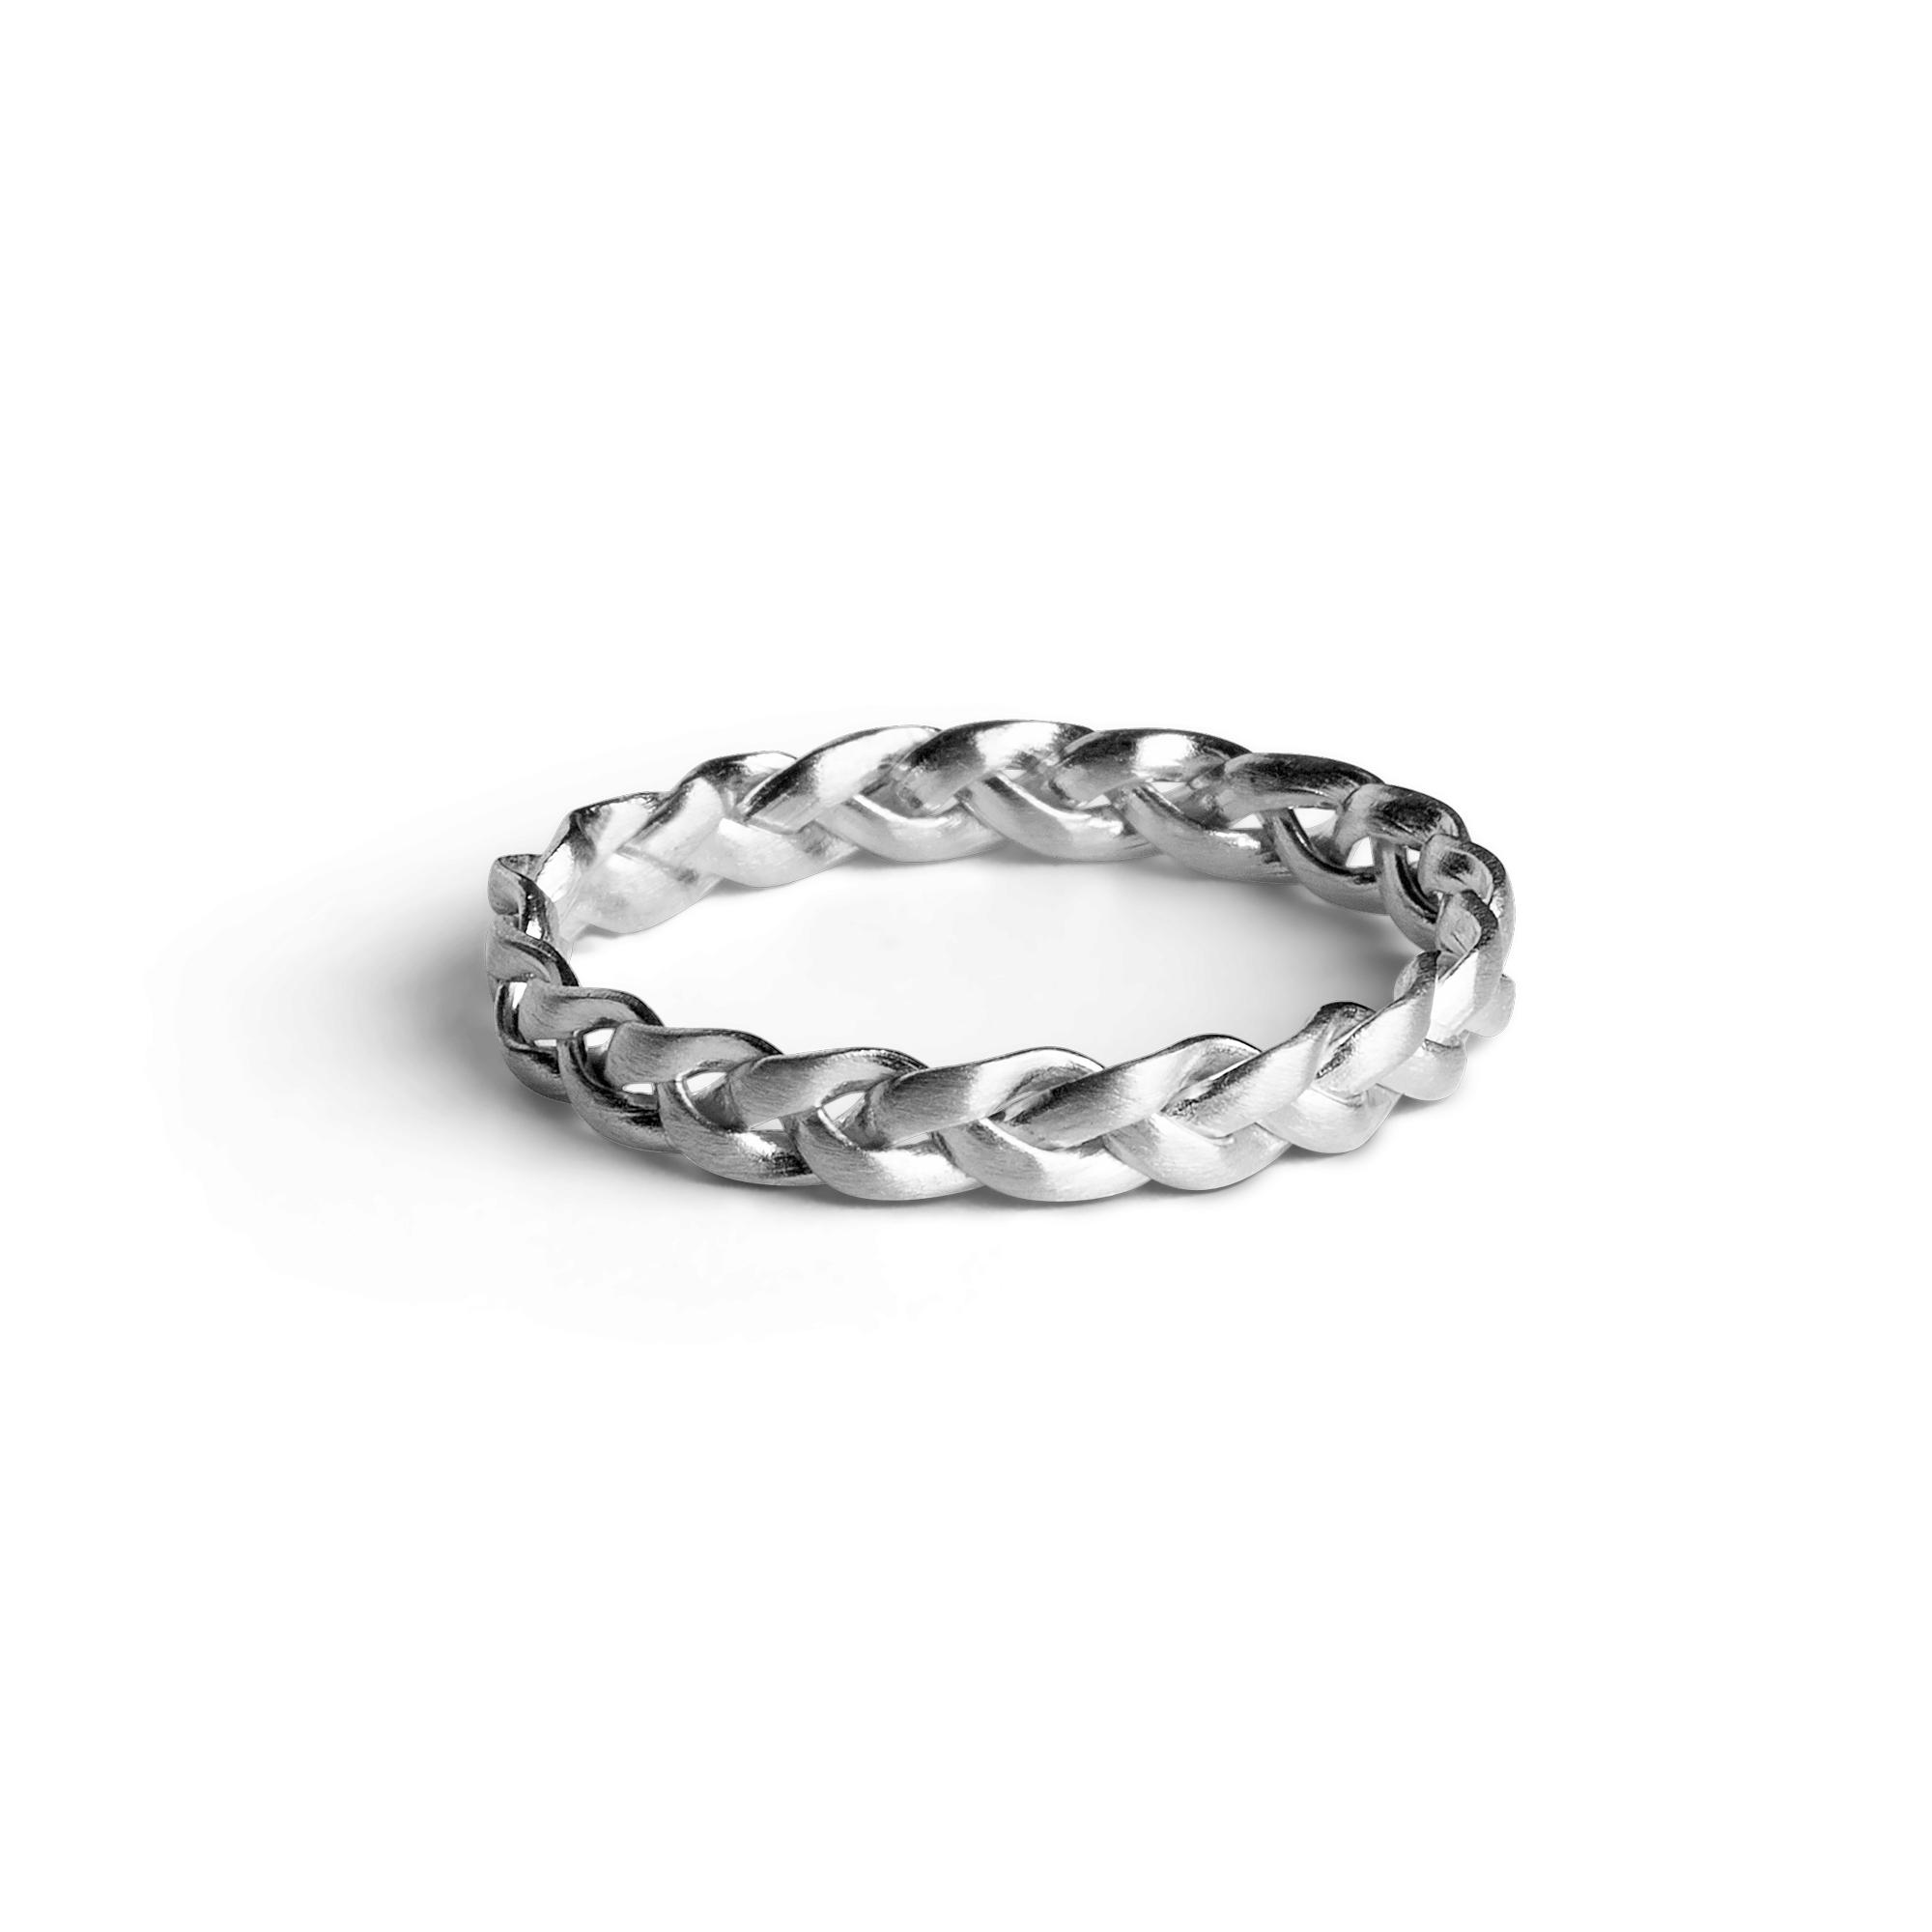 Jane Kønig small Braided ring, sølv, 58